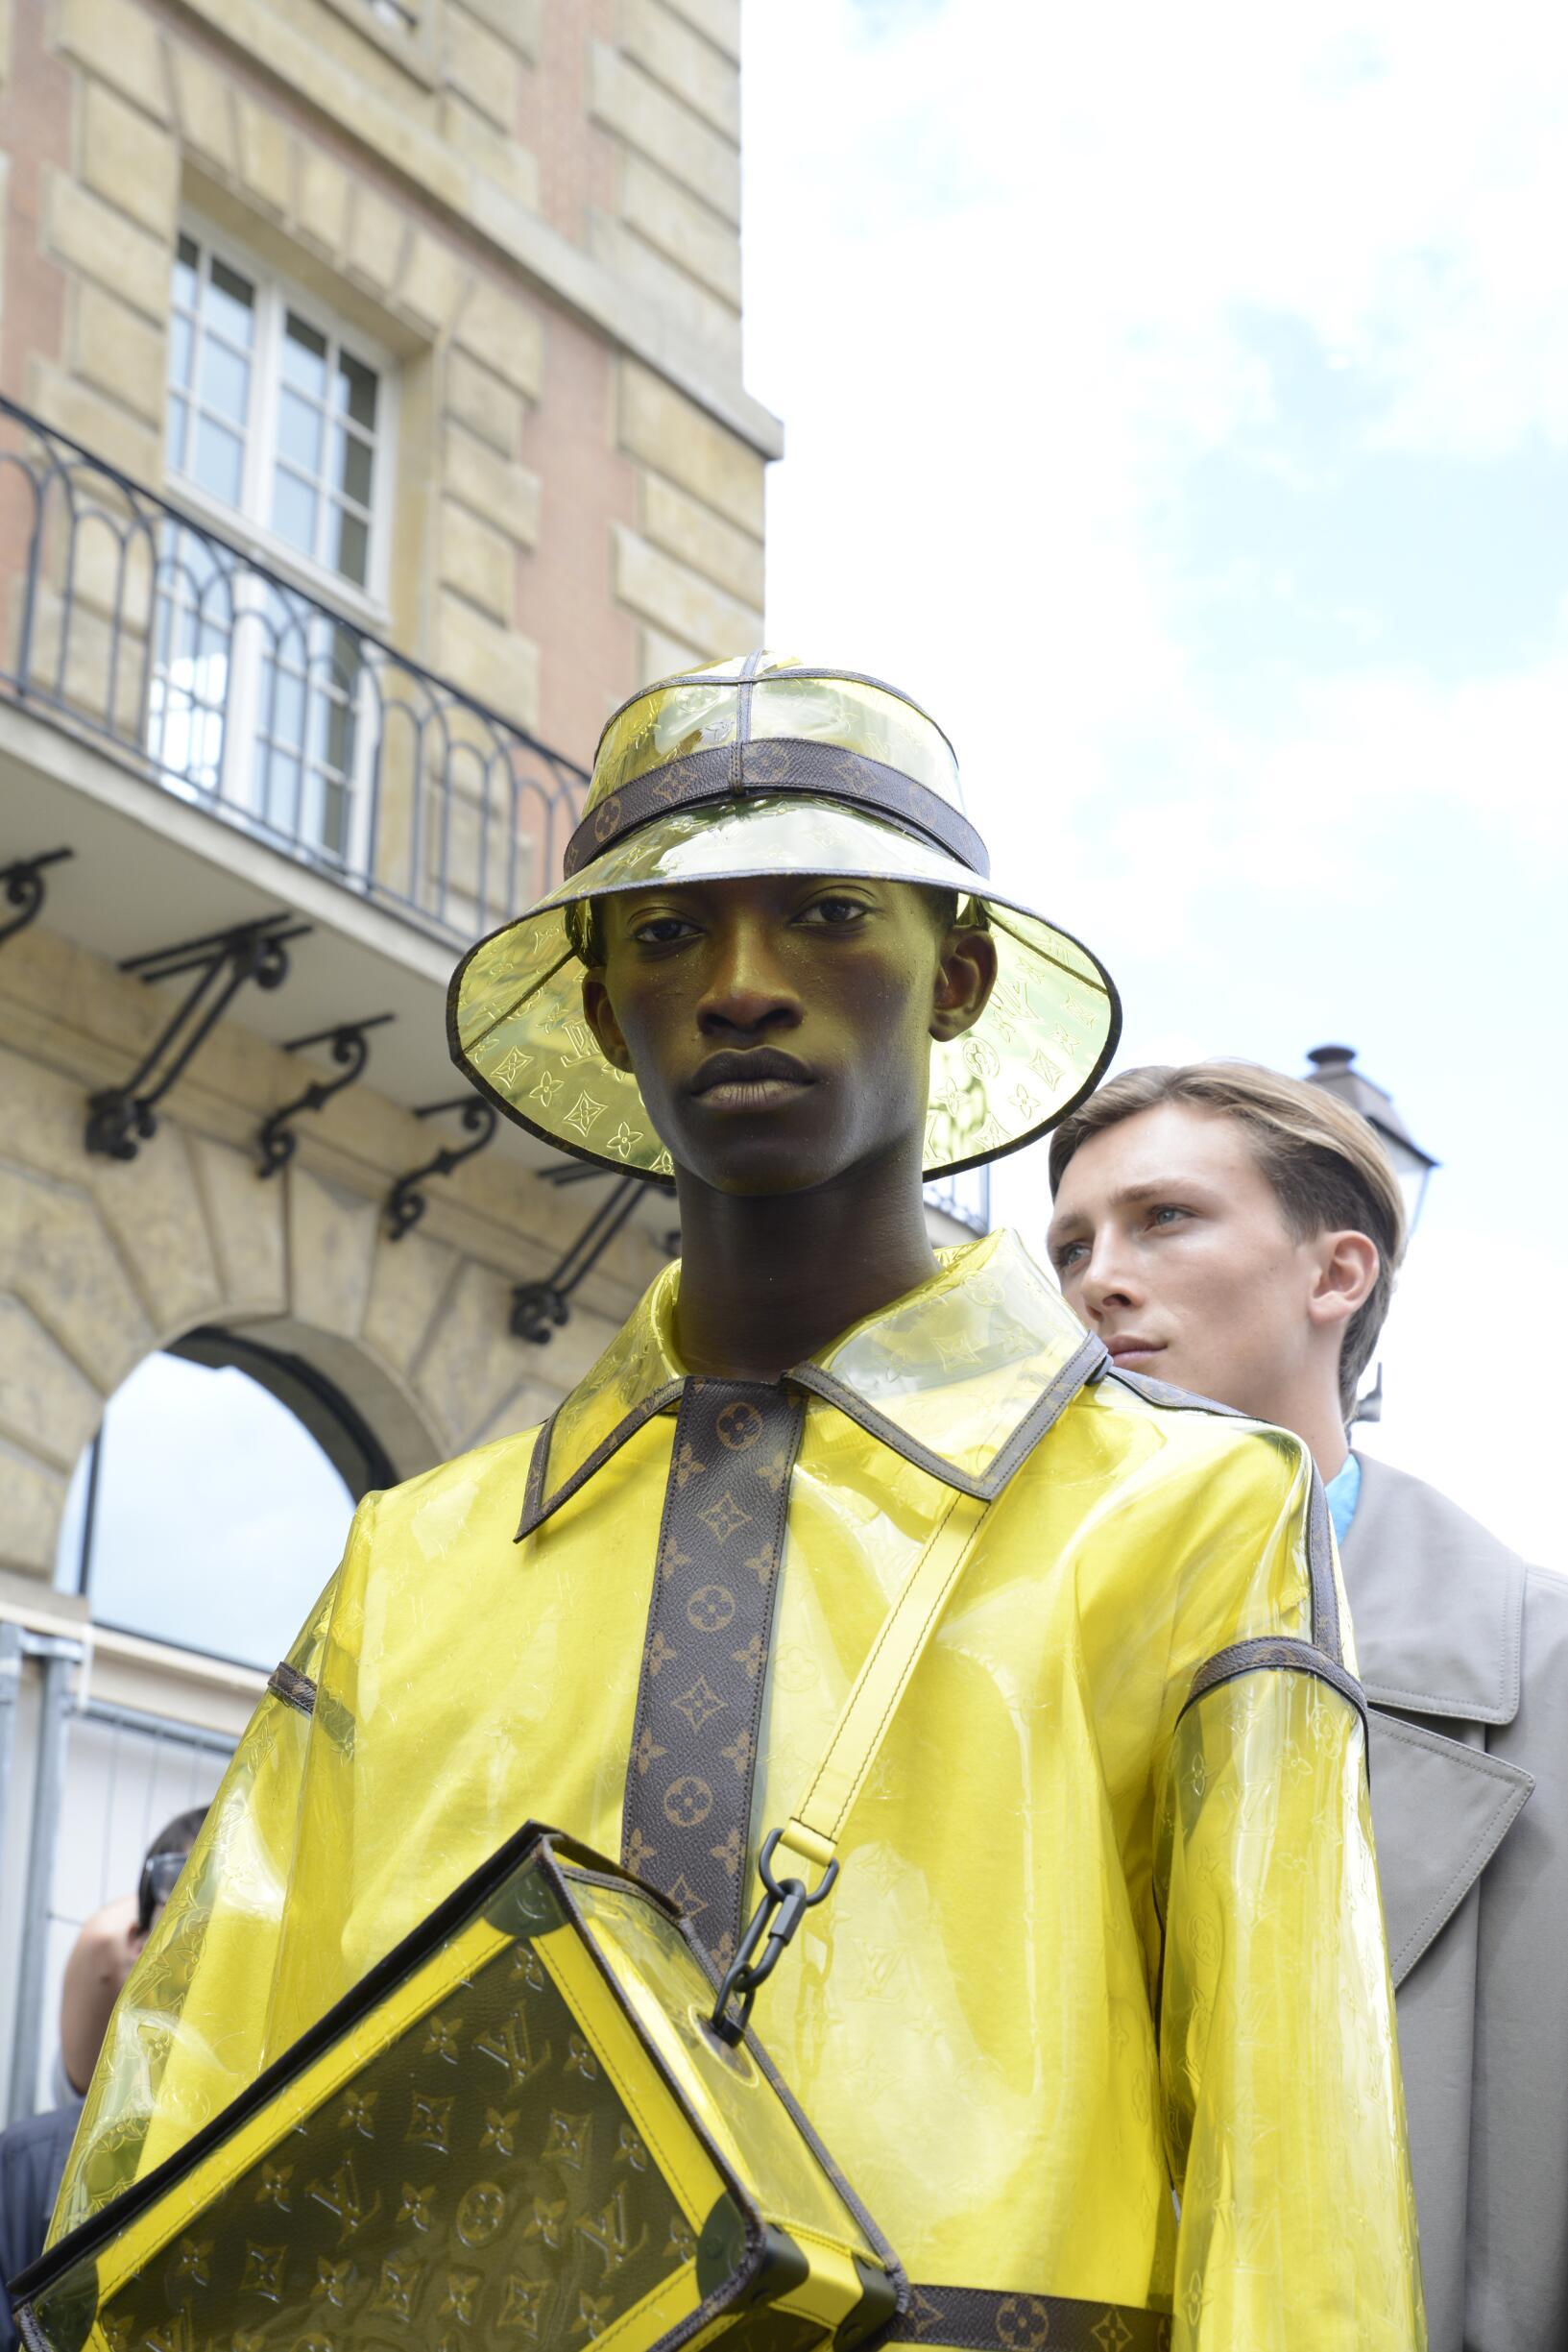 Backstage Louis Vuitton Paris Fashion Week Model